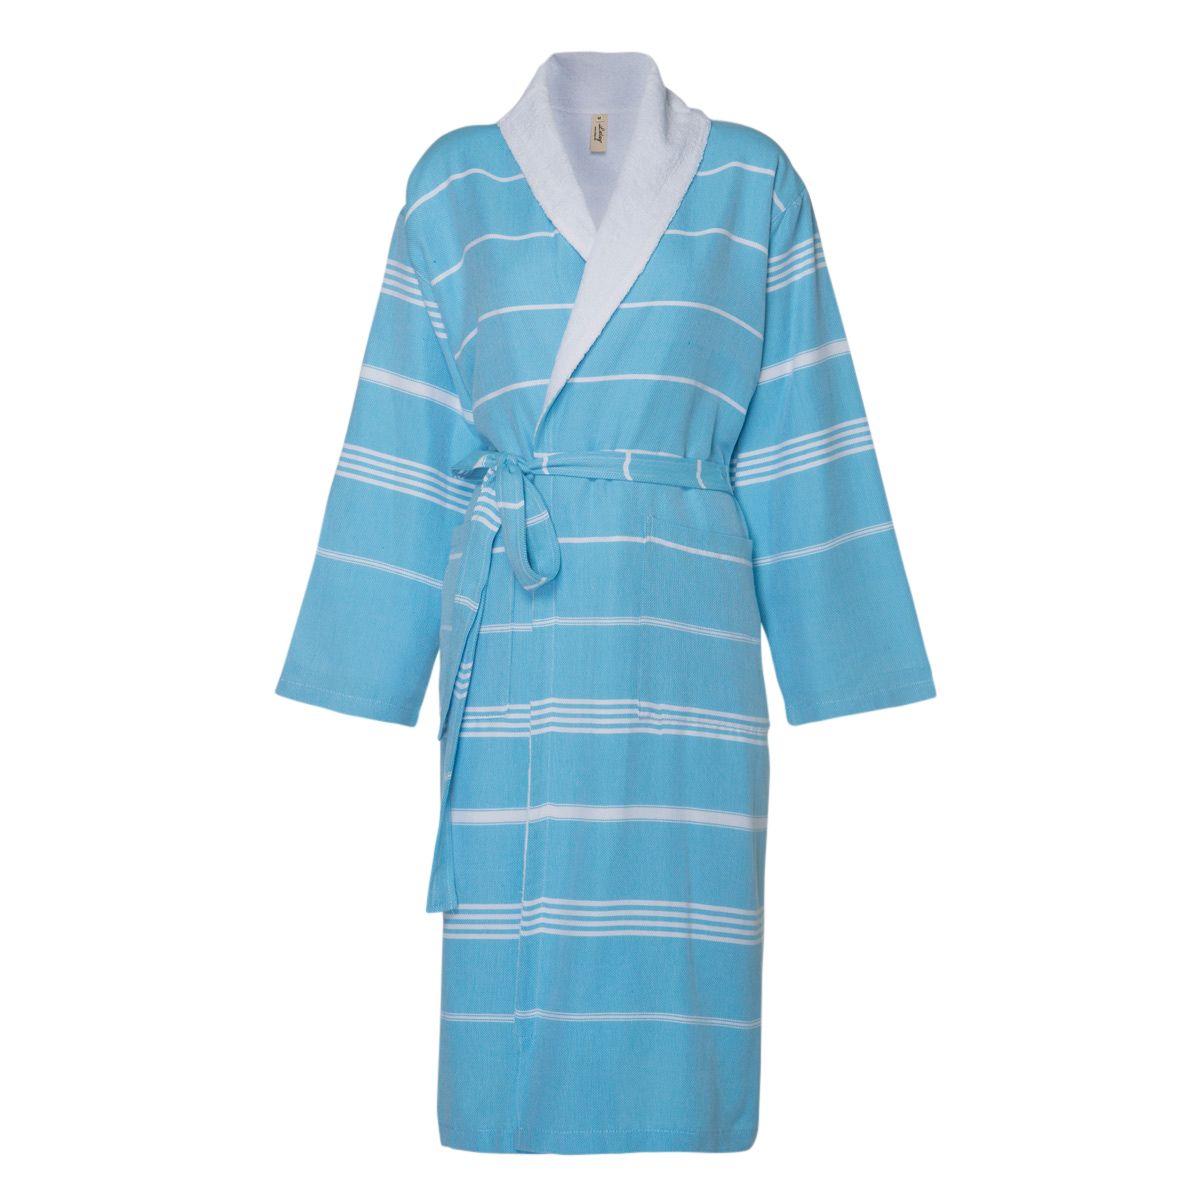 Bathrobe Leyla / With Towel Lining - Turquoise